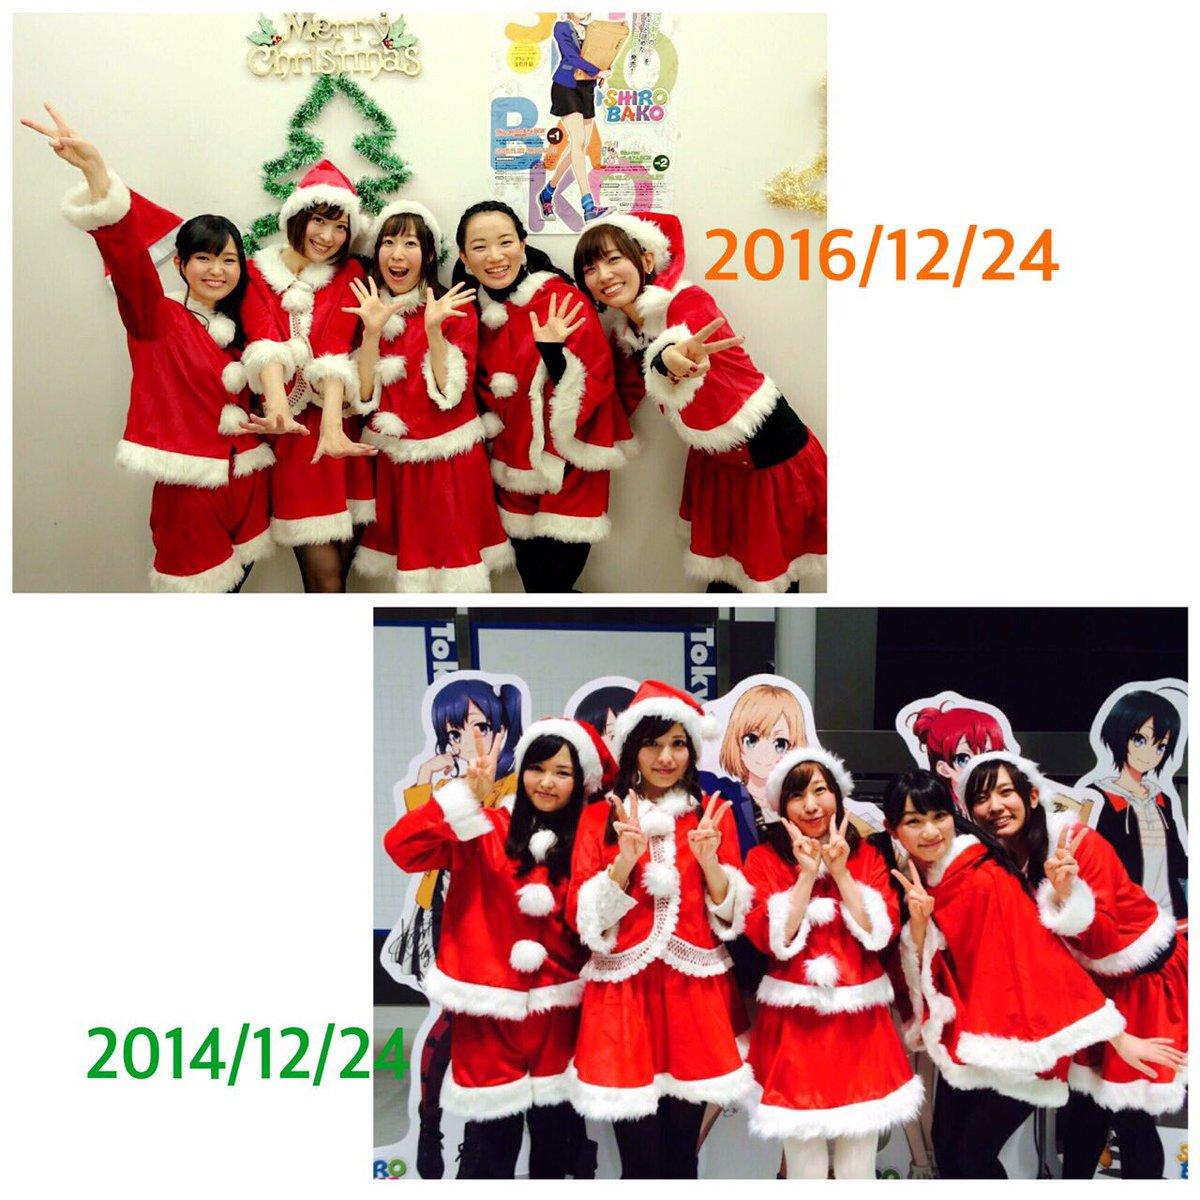 SHIROBAKOニコ生ありがとうございました!2年前と同じサンタ衣装を着て、意外とみんな変わらないねっていう話になりま